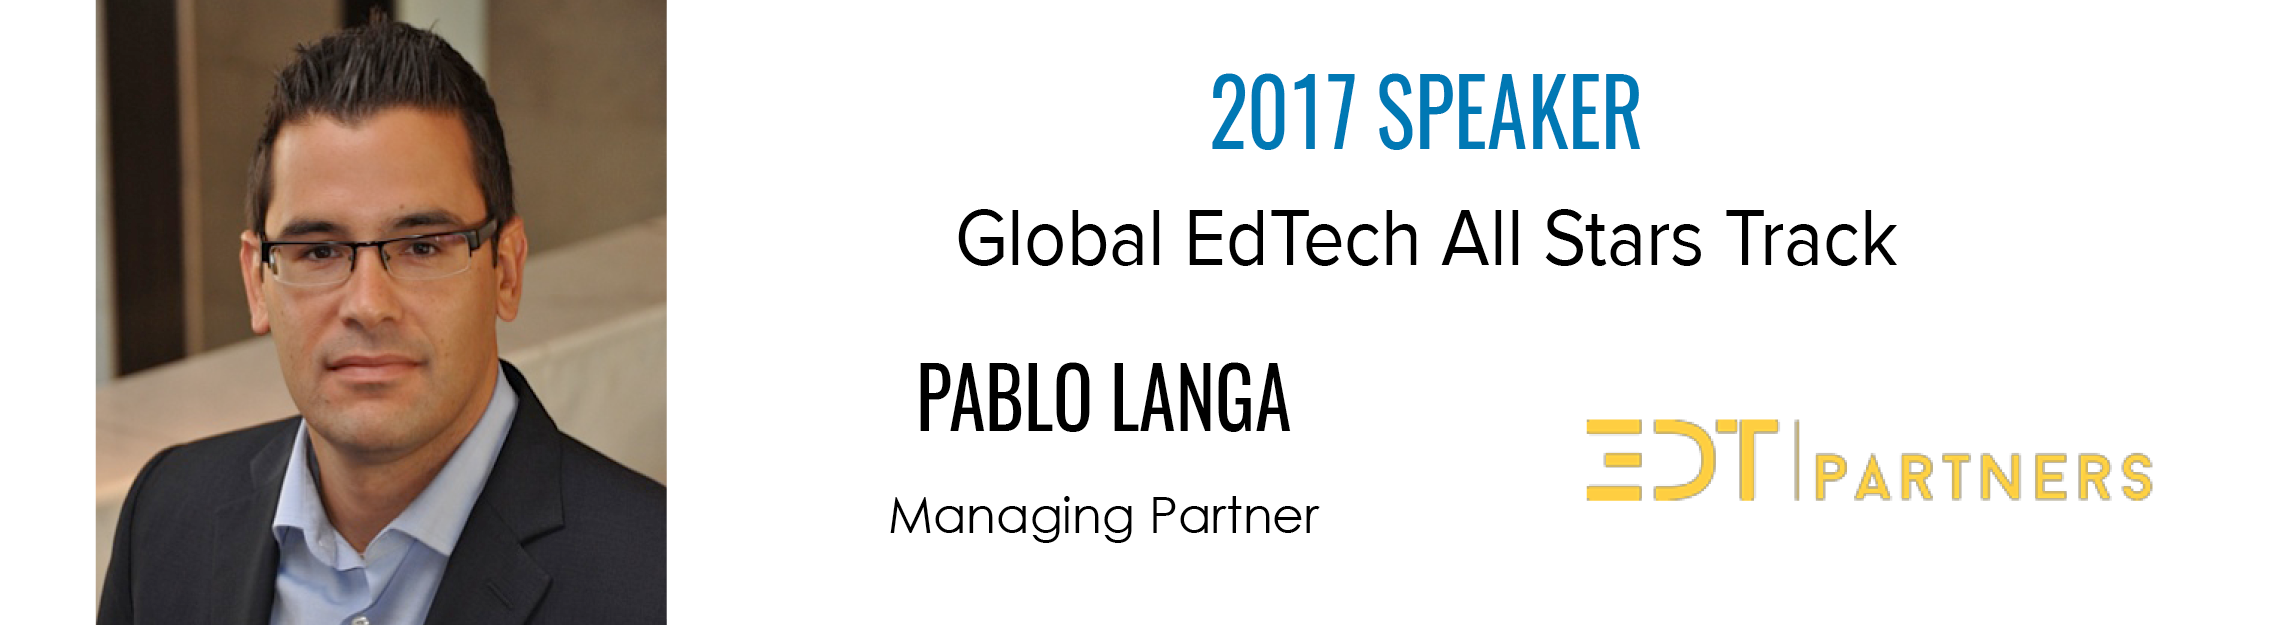 Pablo Langa_EdTech Partners-1.png